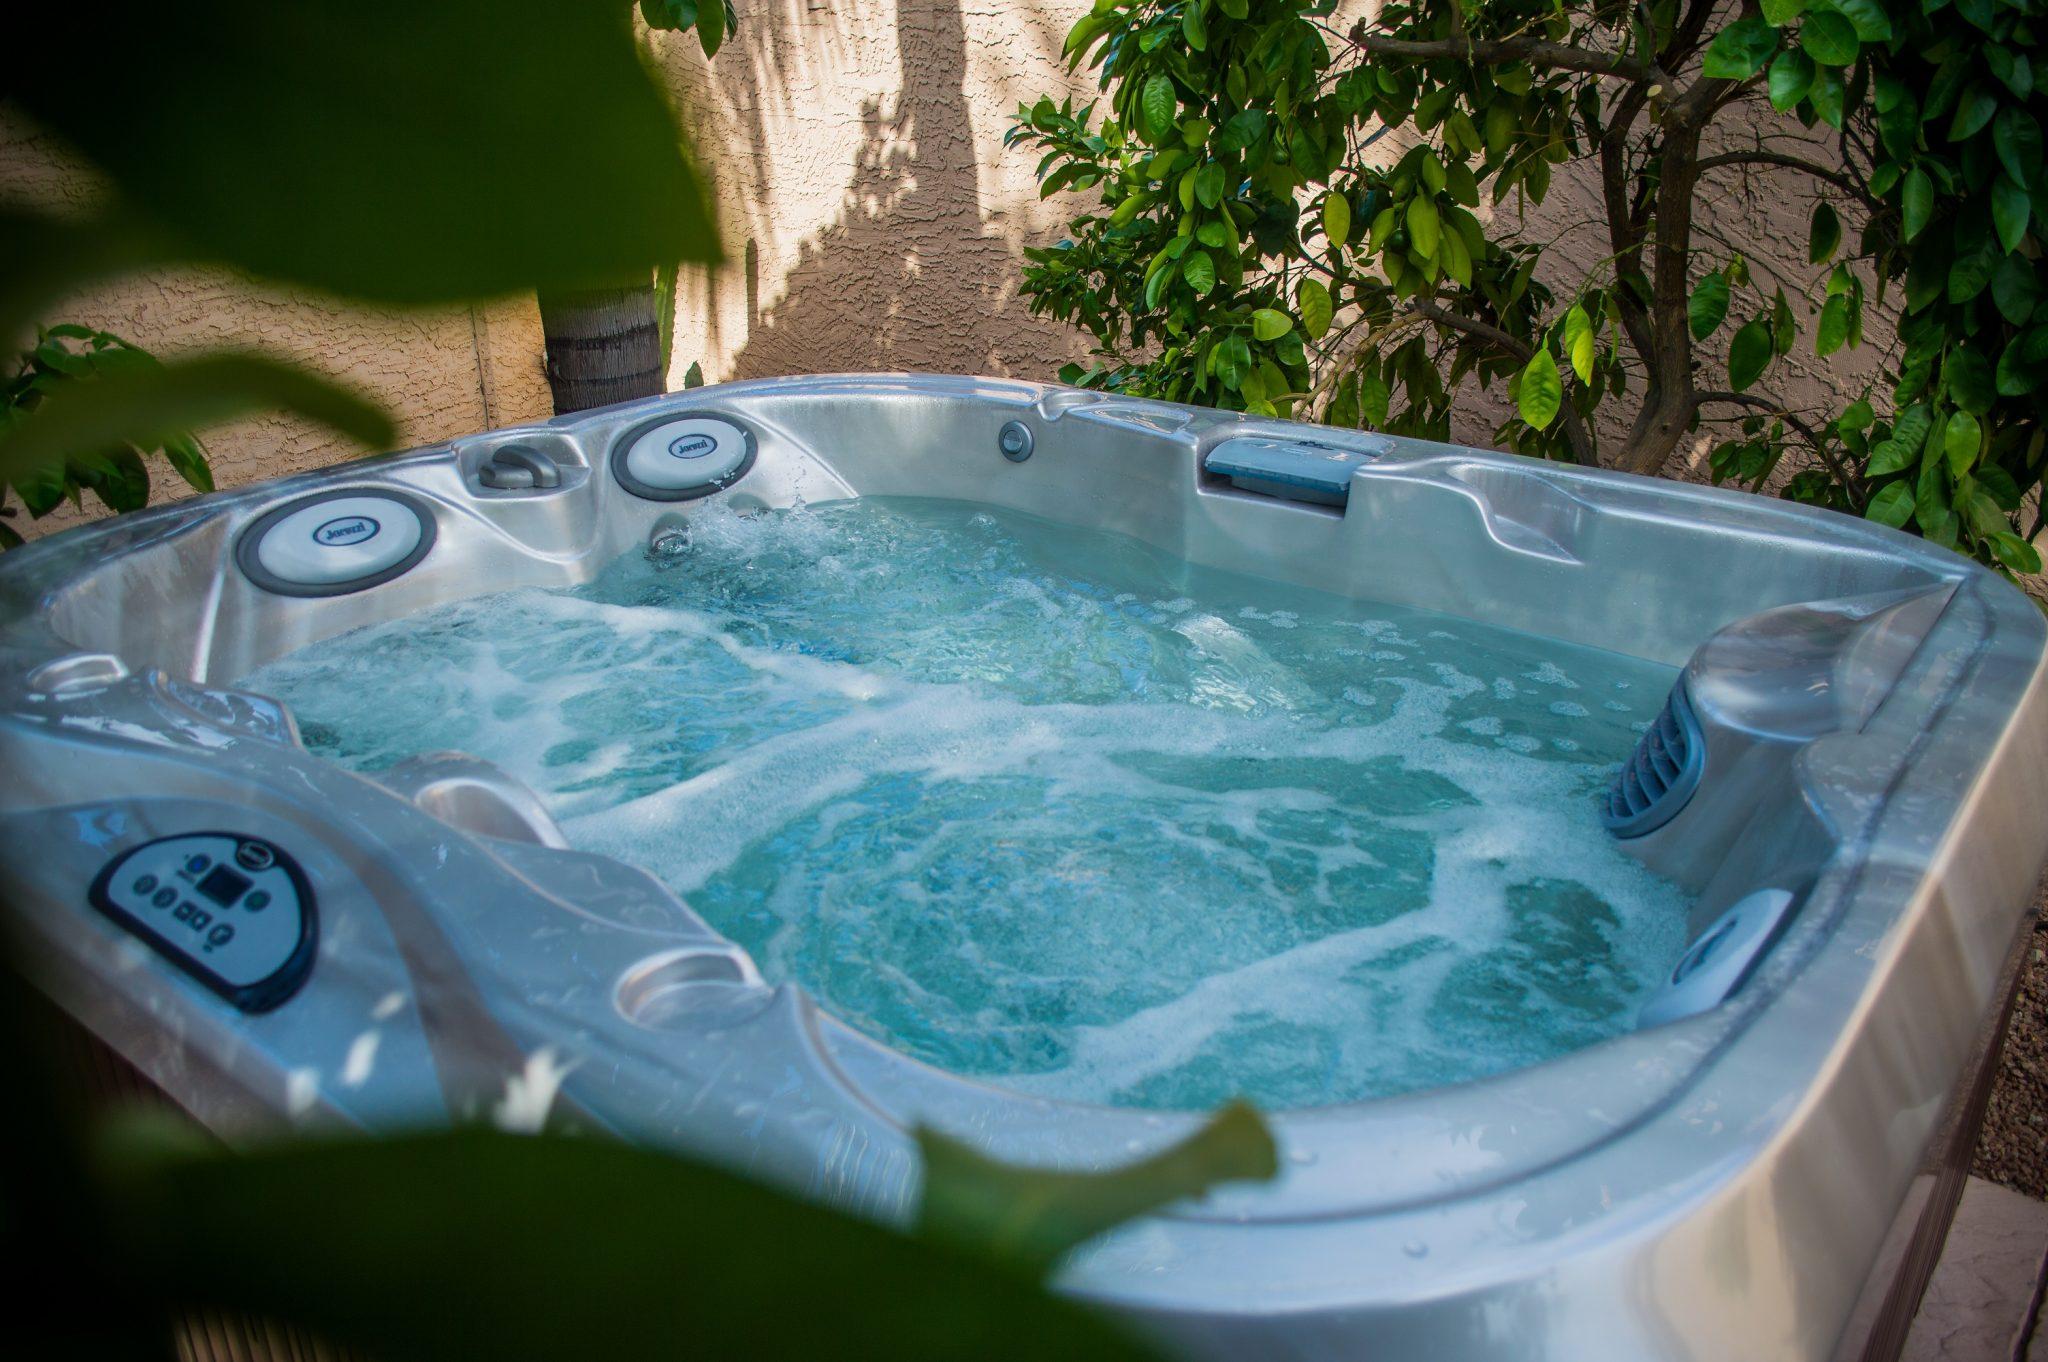 Outdoor Jacuzzi Hot Tub in Ontario